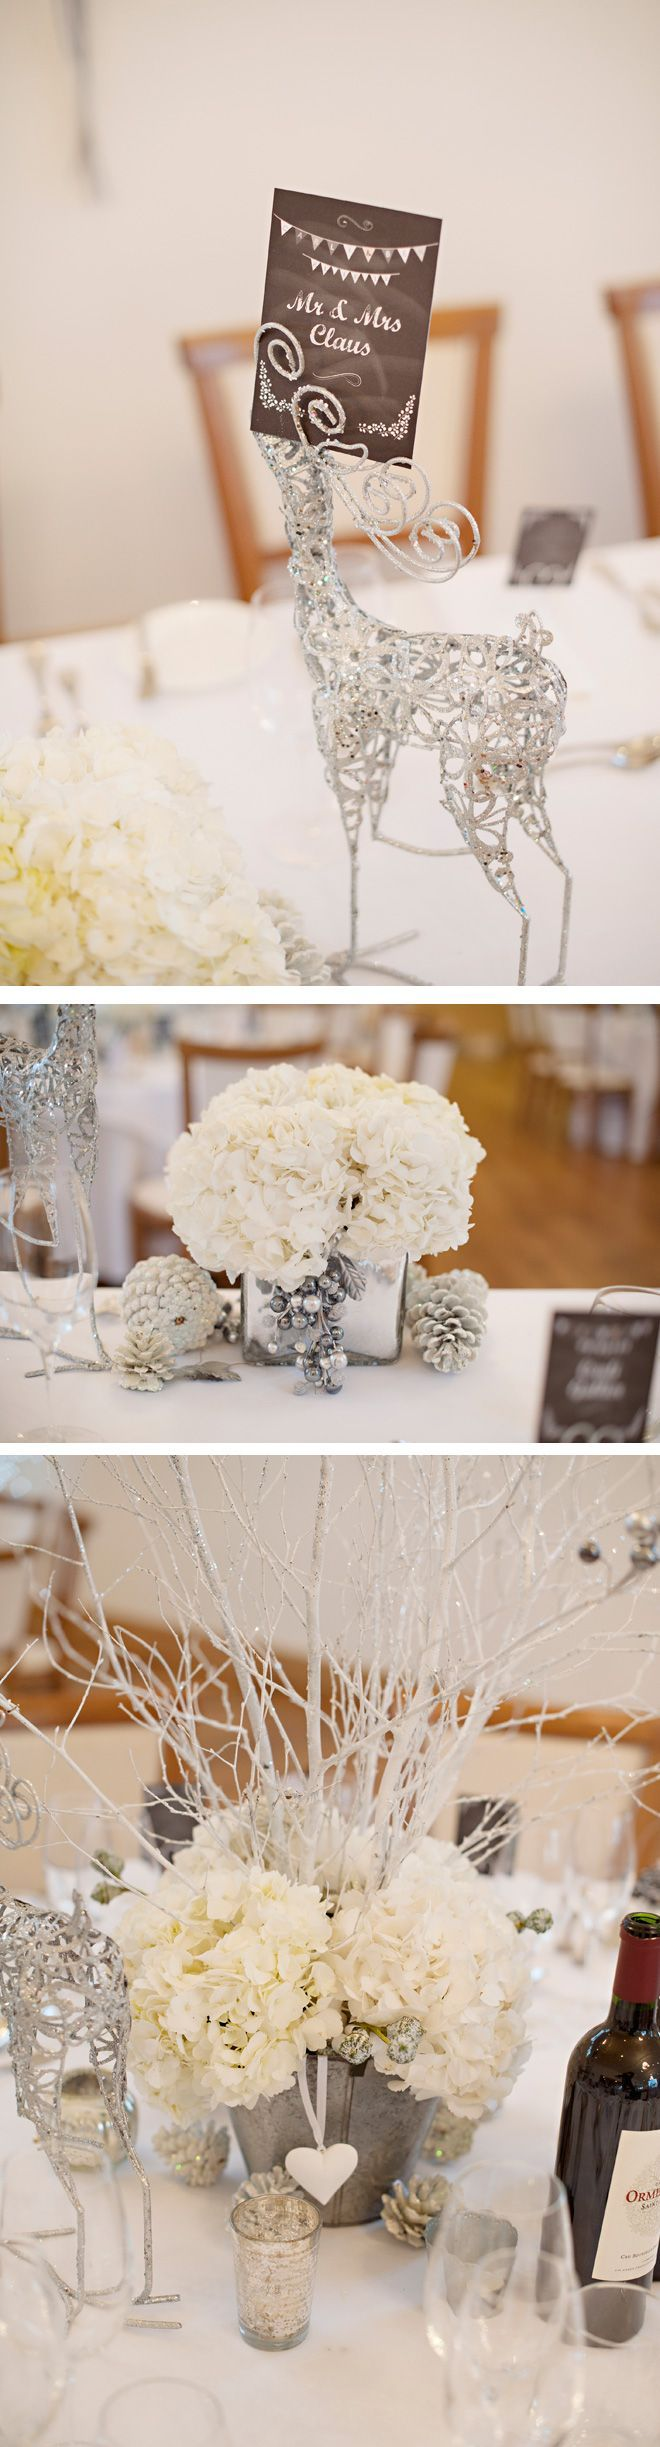 Christmas Wedding Ideas | Wedding Themes